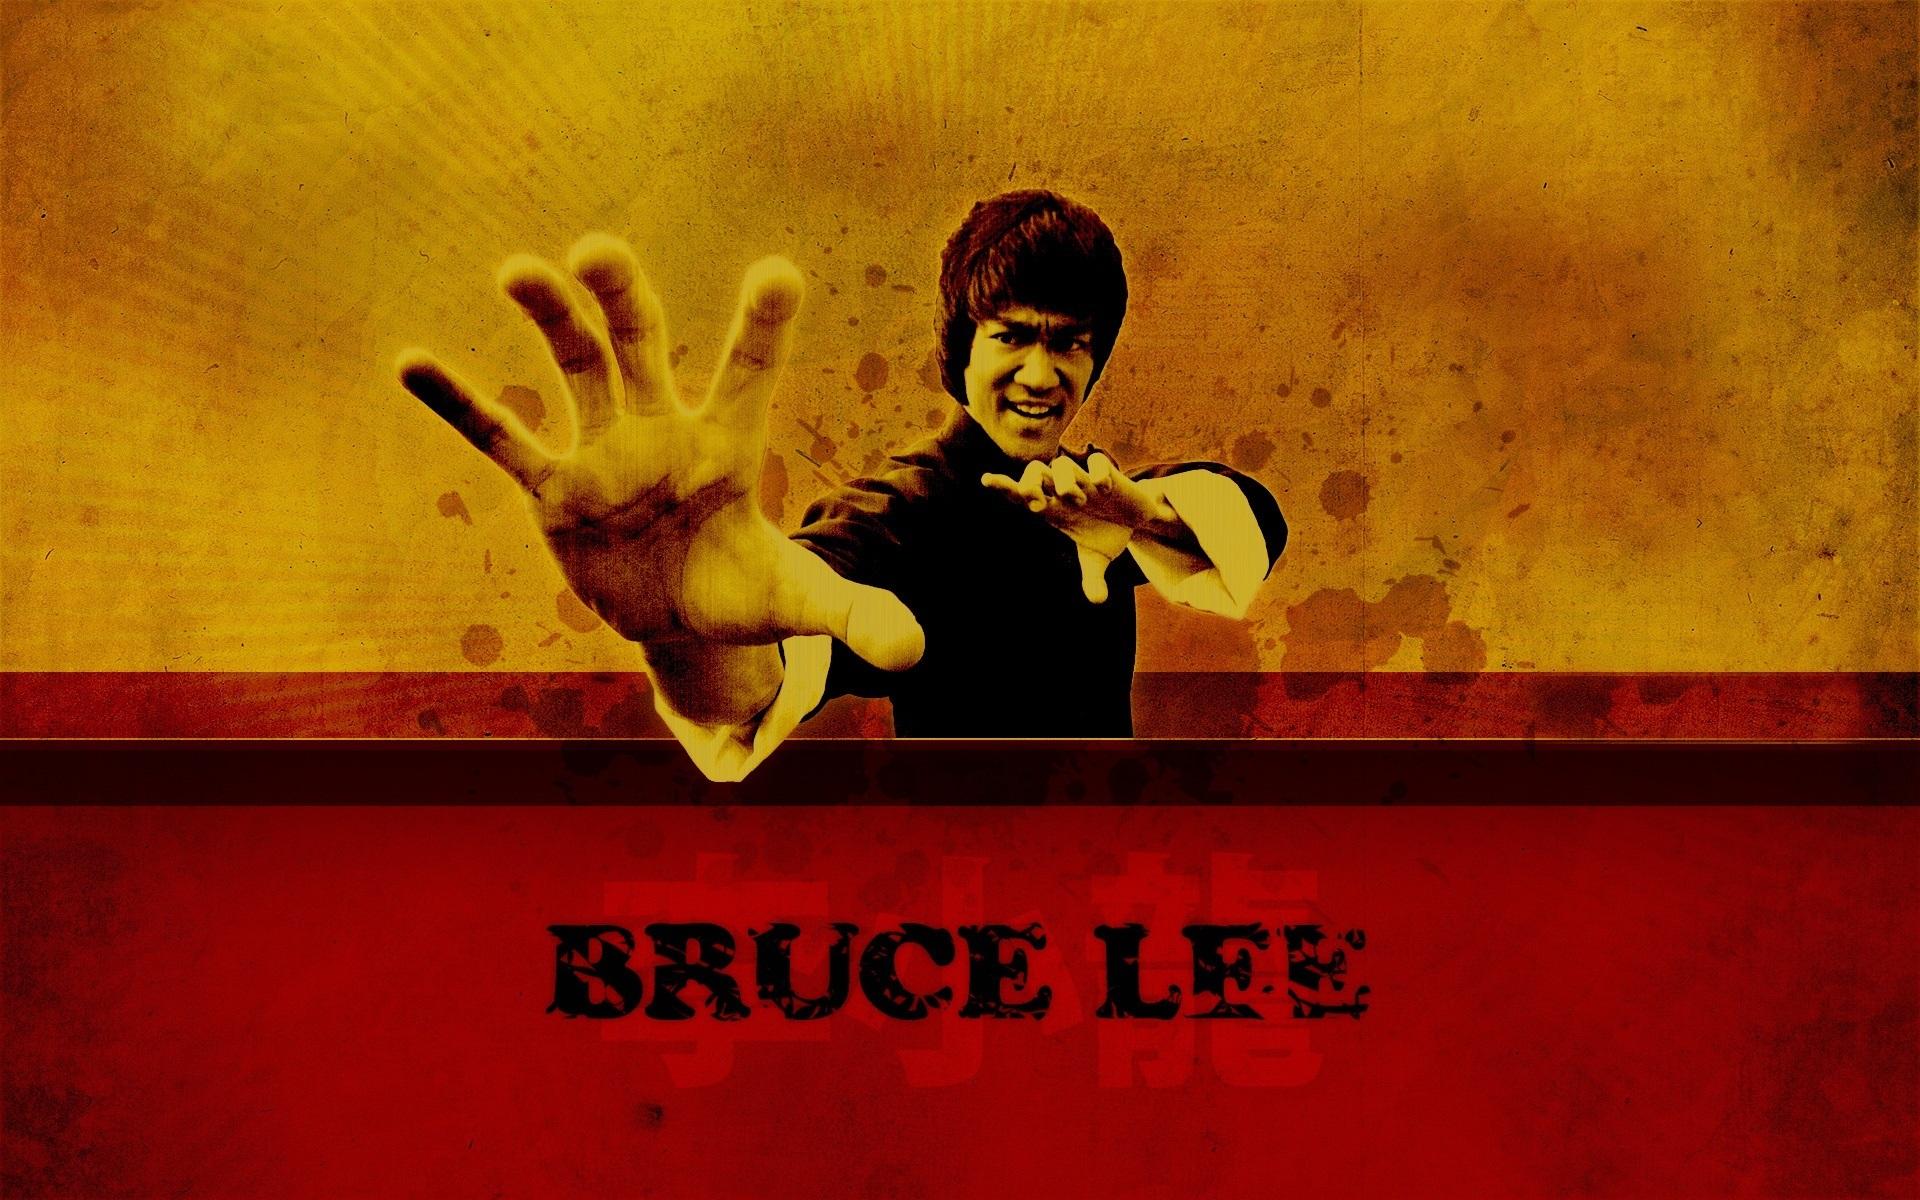 Bruce Lee Wallpaper 16